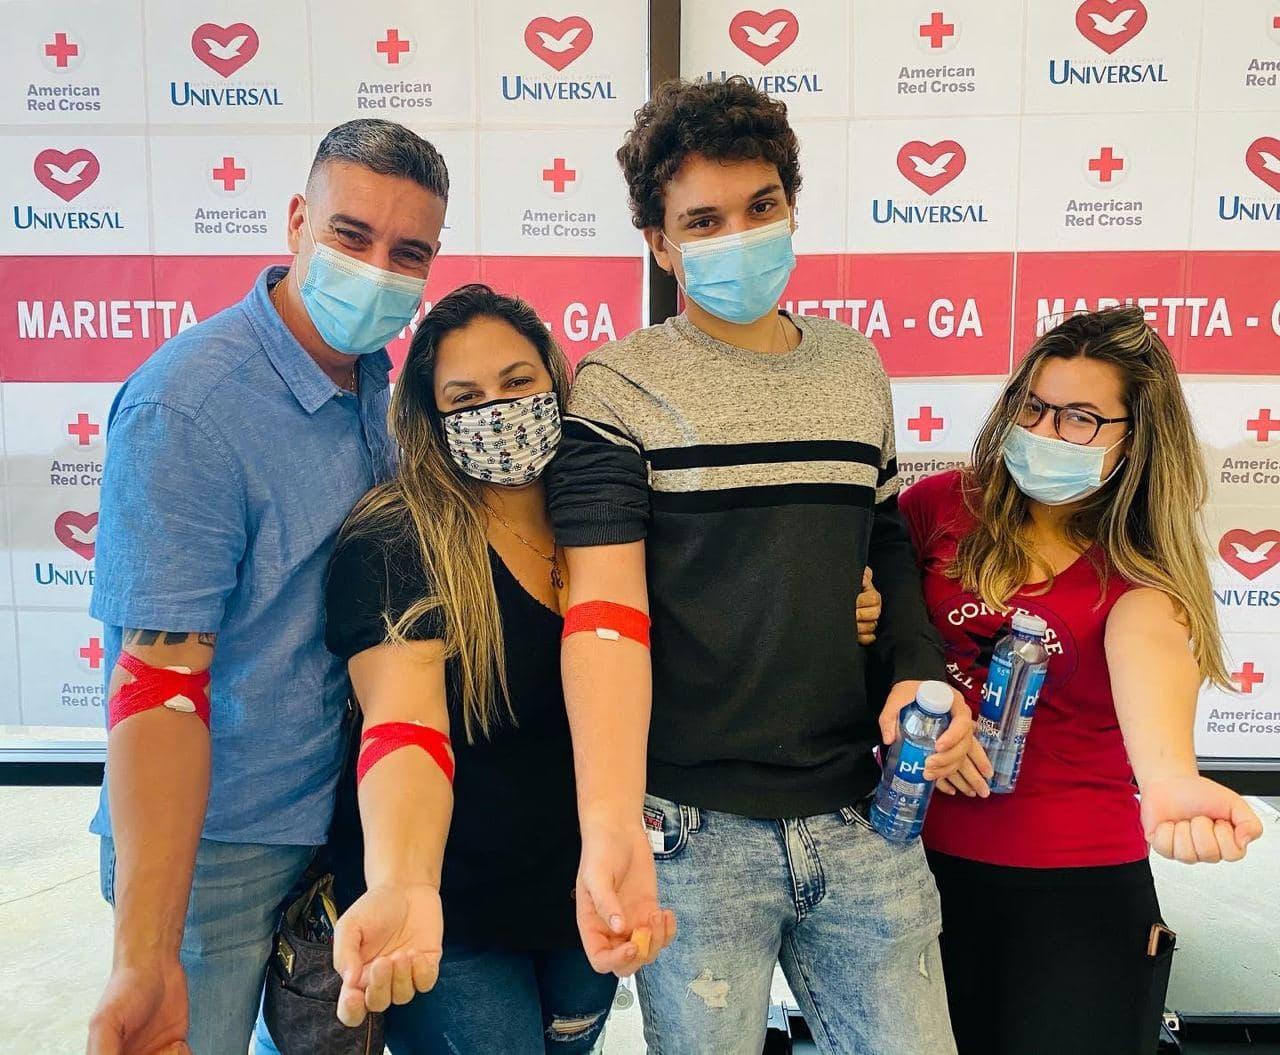 Universal em Marietta, GA, realiza coleta de sangue pela segunda vez